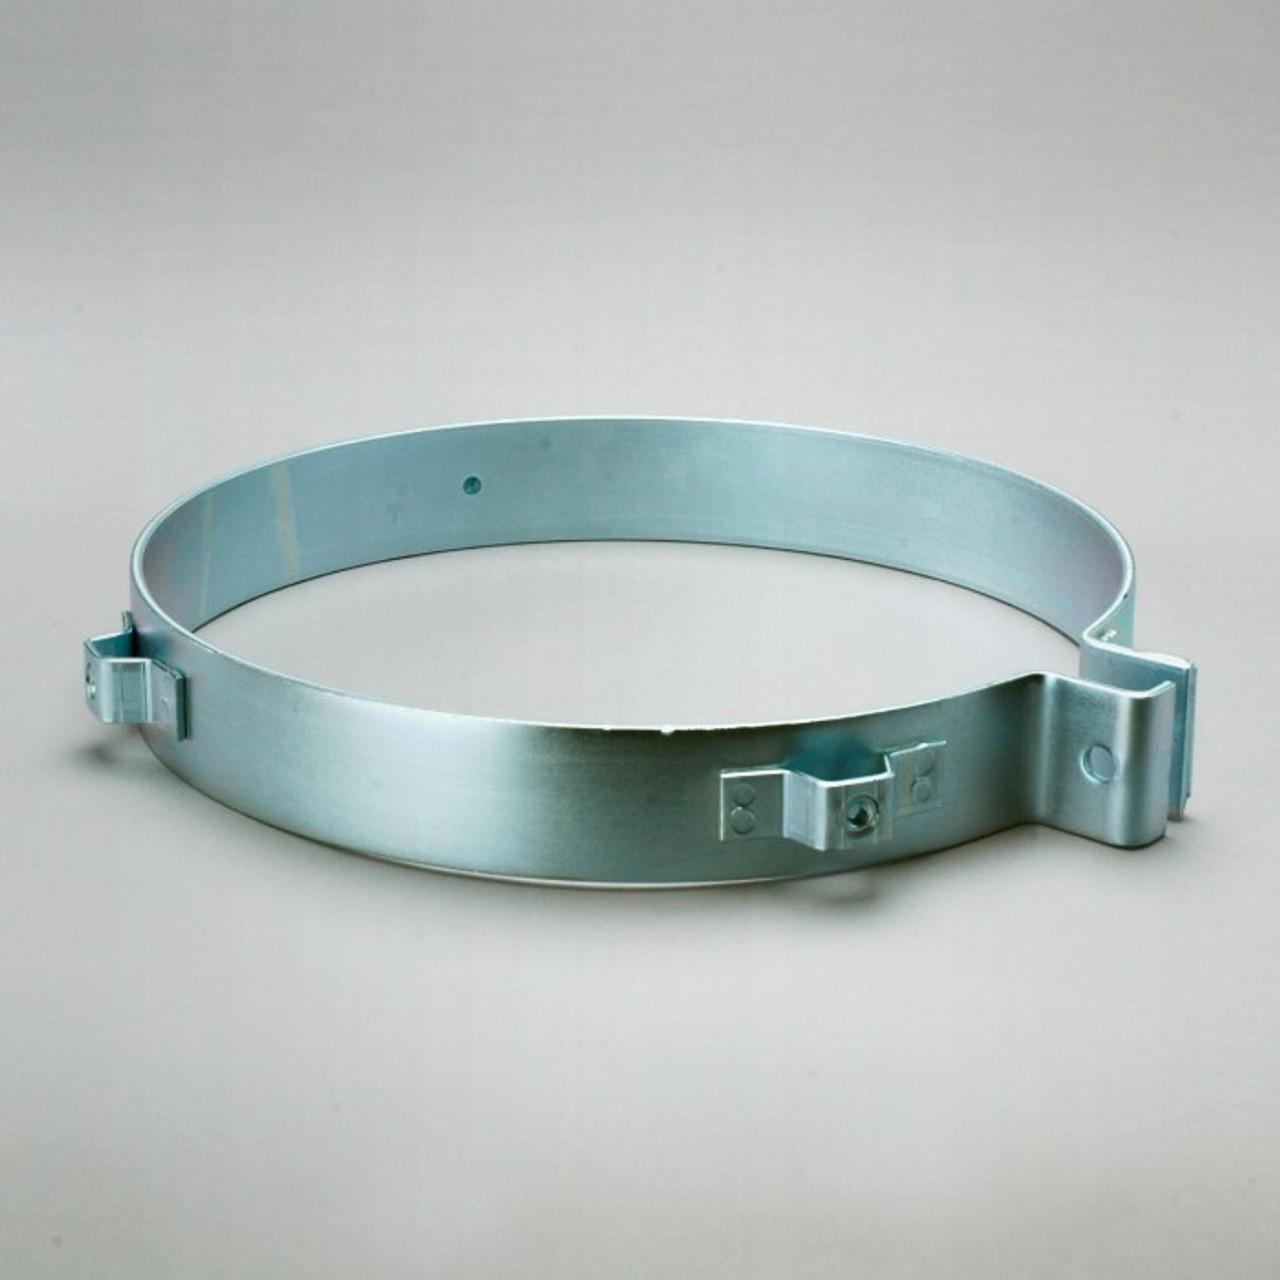 "Muffler Heat Shield Clamp- for 8.5"" Body Mufflers"